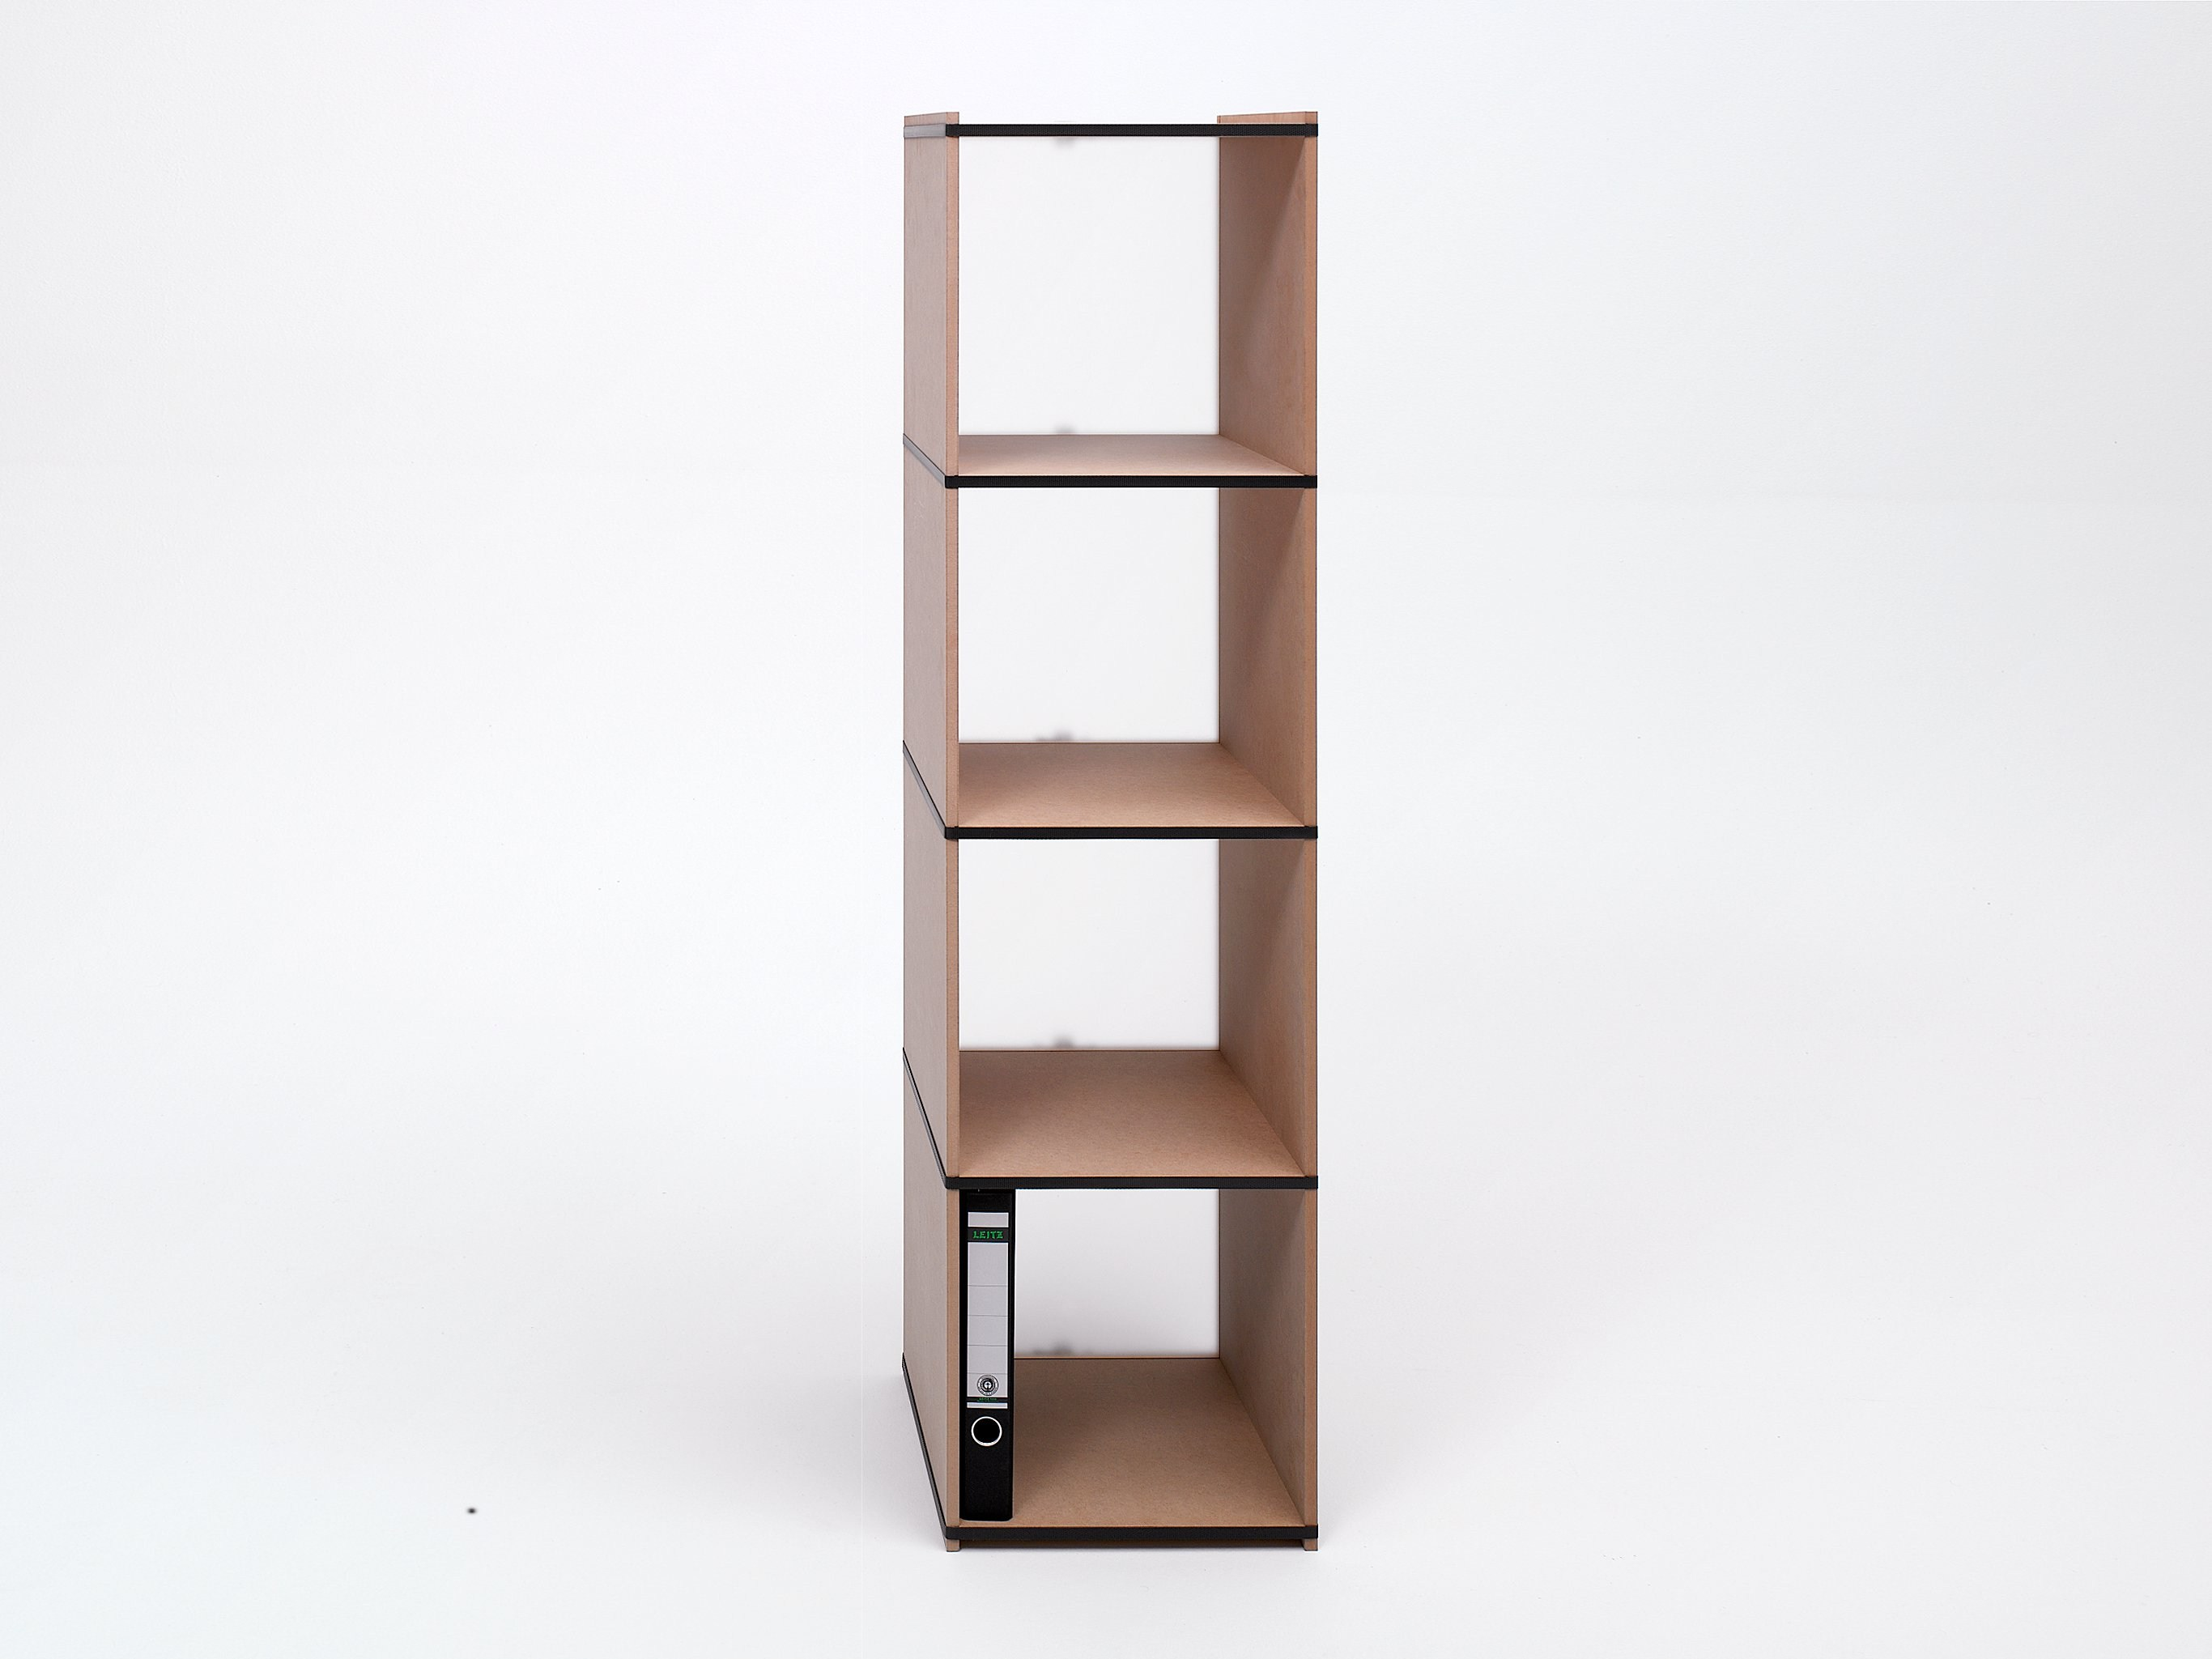 Étag u00e8re modulable en fibre de bois AKTENPACK by Tojo Möbel design Hartmut Ringel # Etagere Modulable Bois